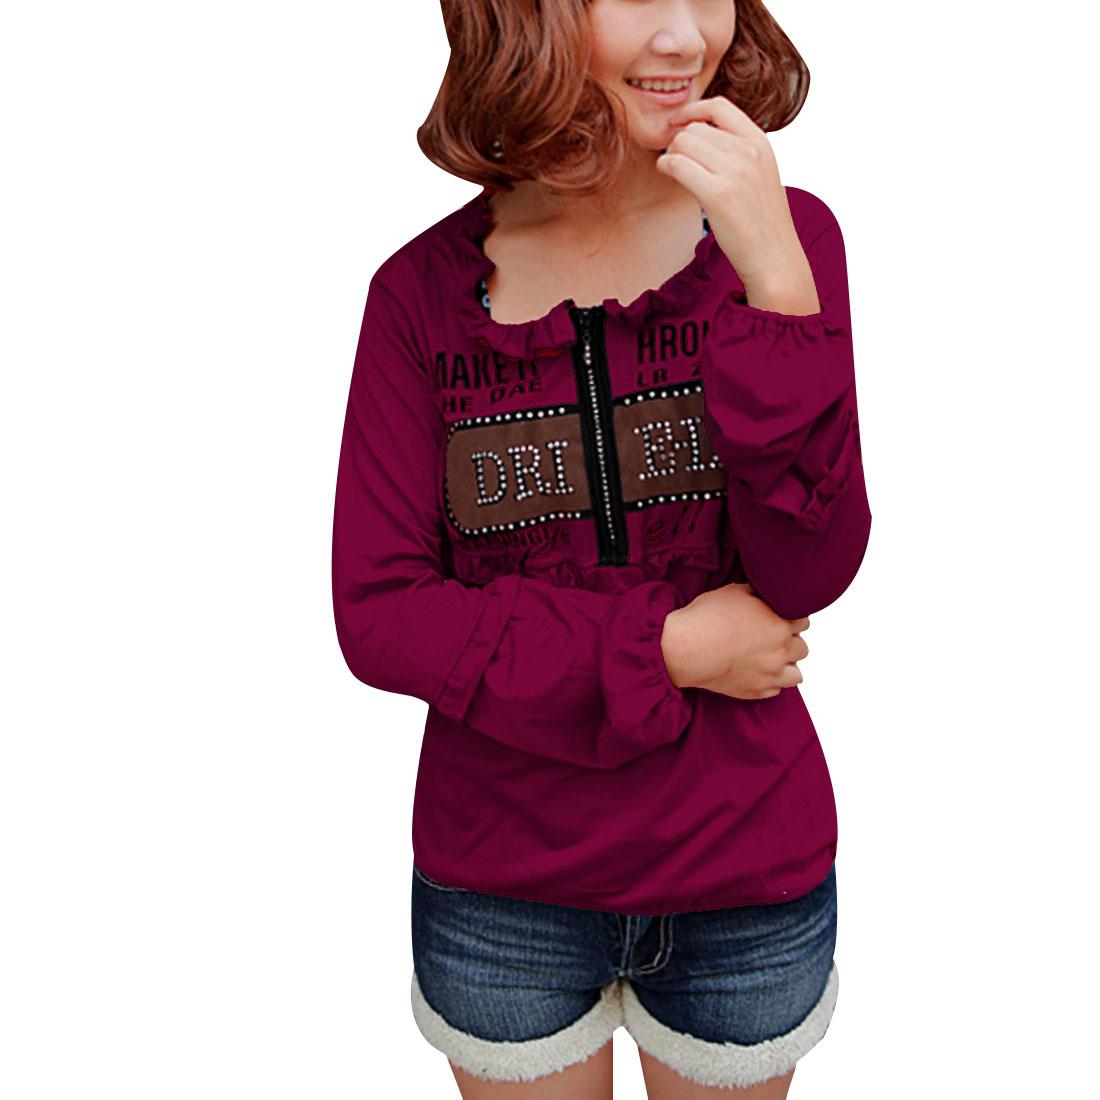 Ladies Amaranth Red Elastic Sleeves Cuff Ruffled Neckline T-shirt XS